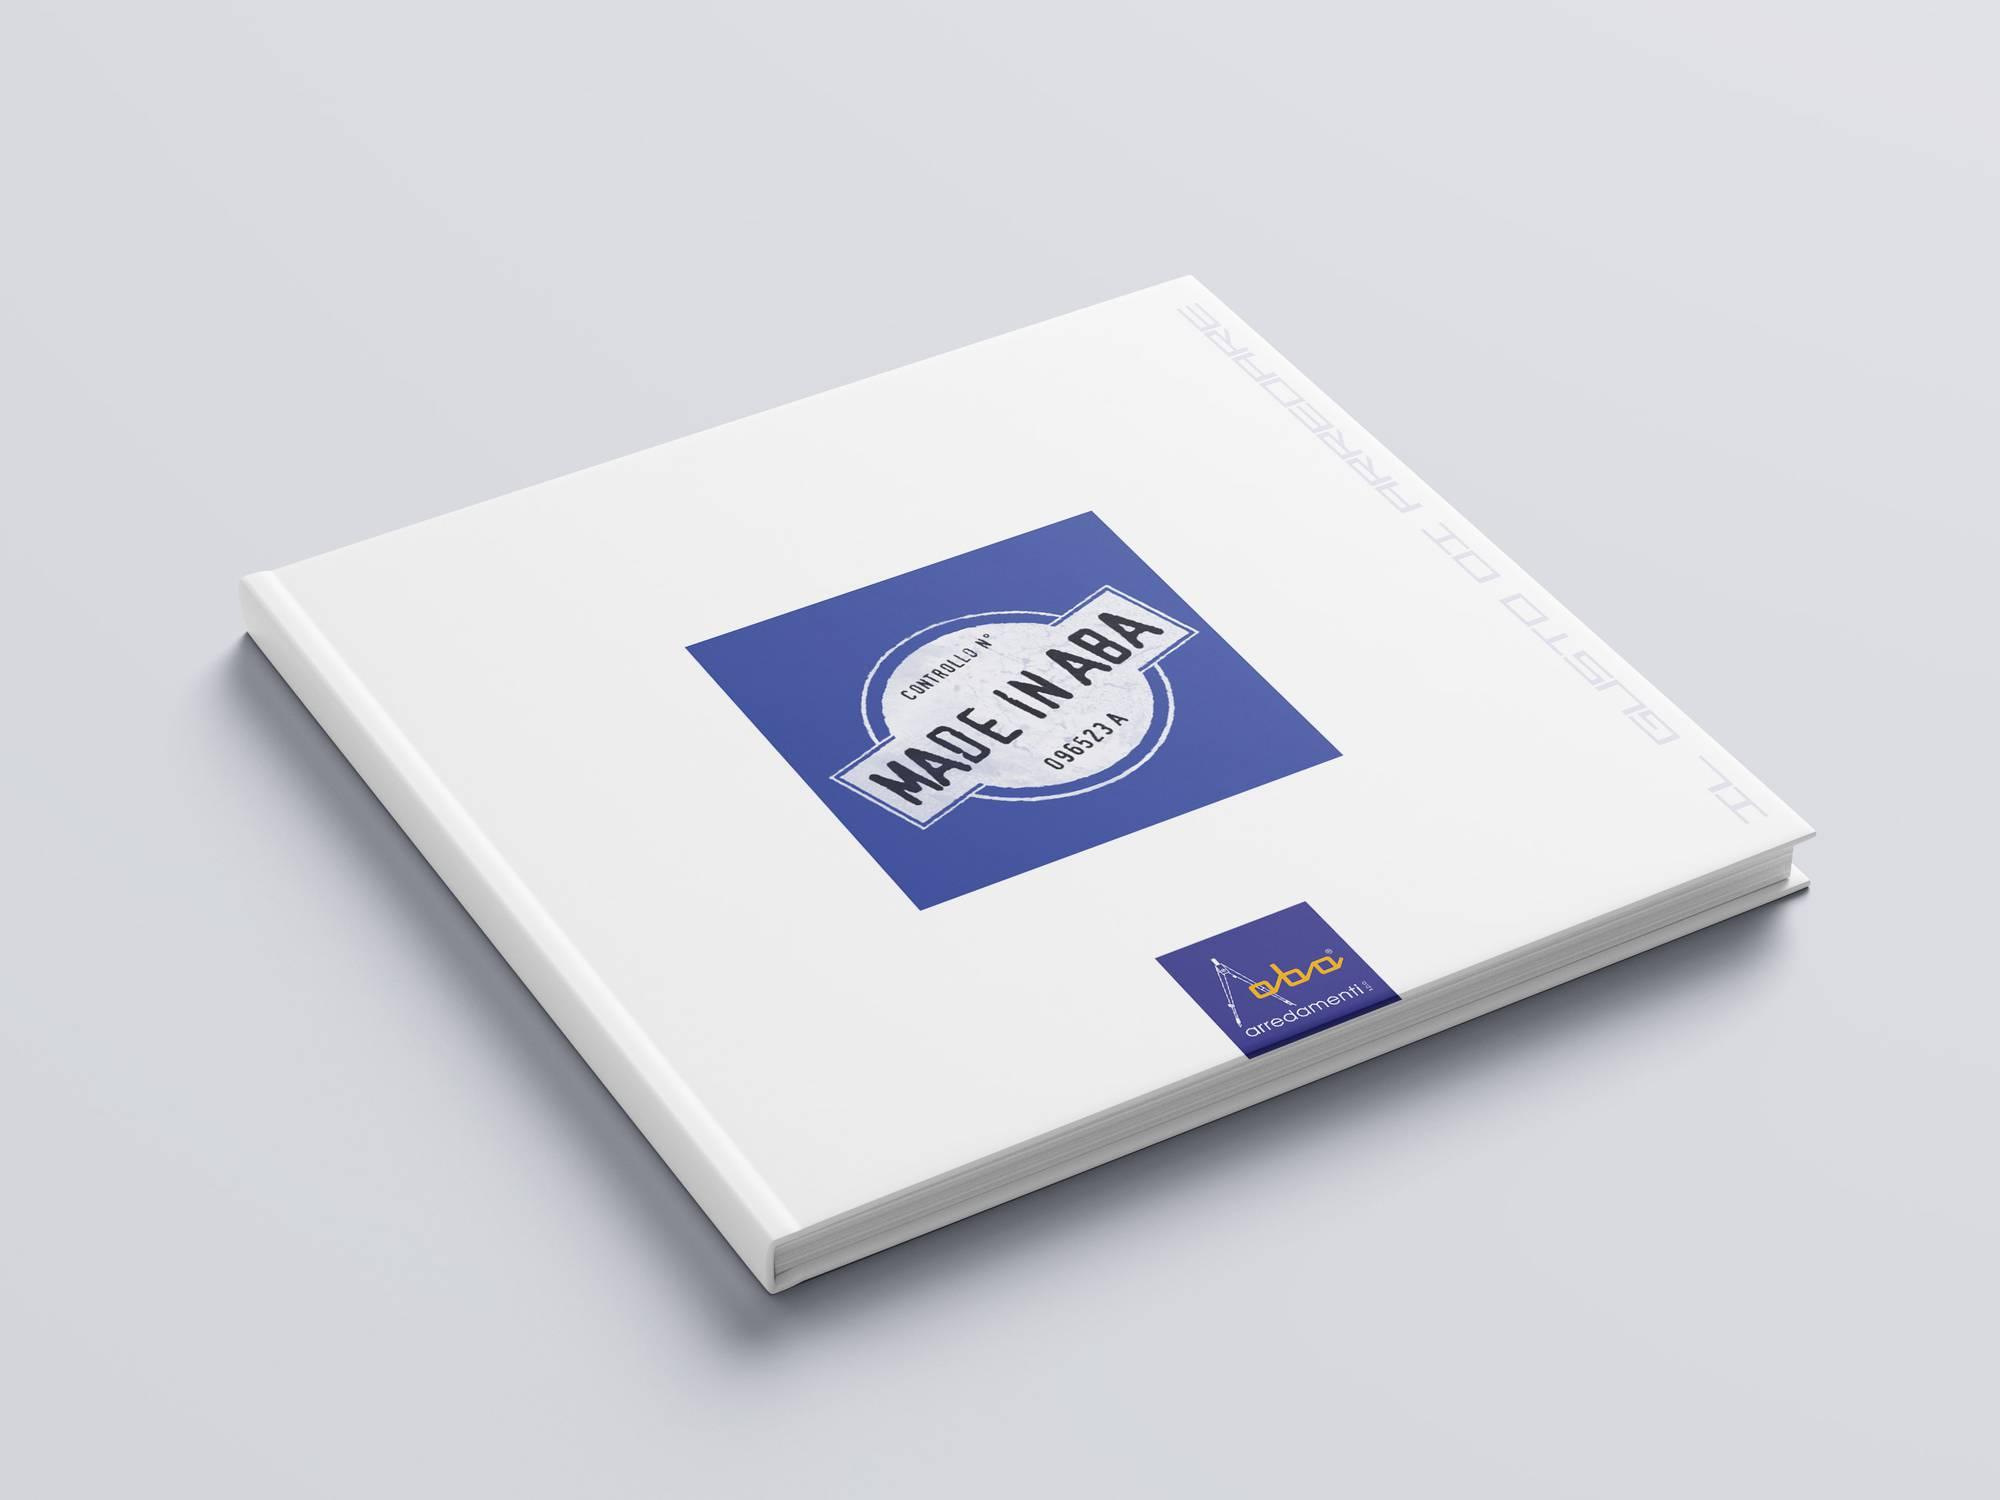 Book-ed-8.jpg